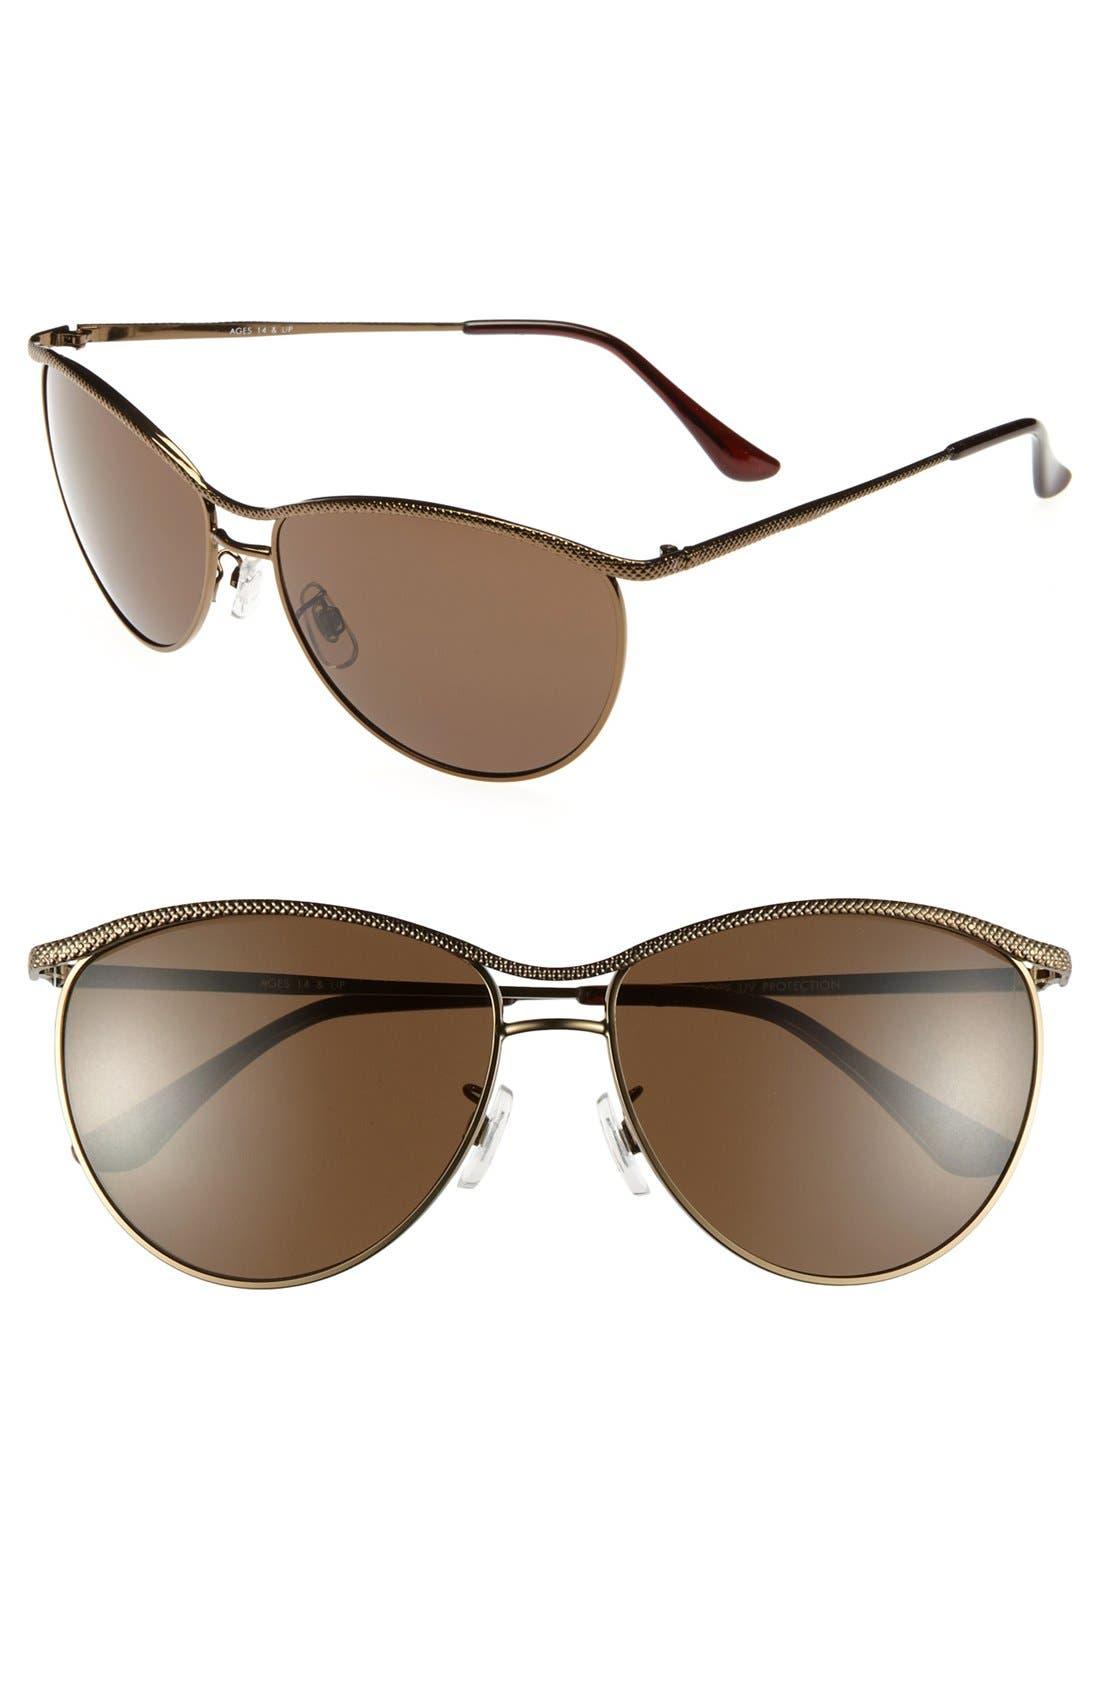 Alternate Image 1 Selected - FE NY 'Harley' Sunglasses